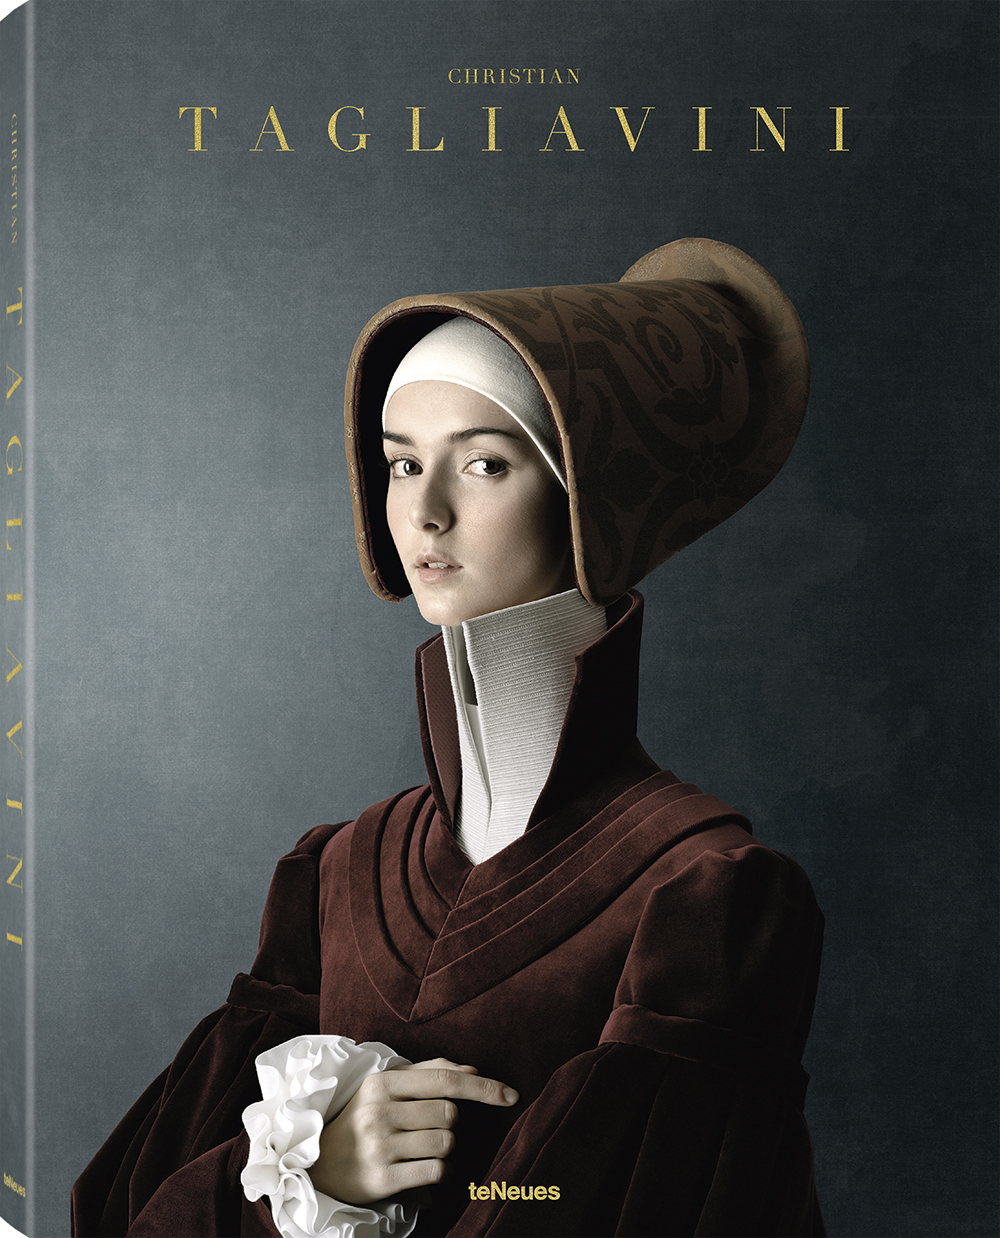 Christian Tagliavini, isbn 9783961710850